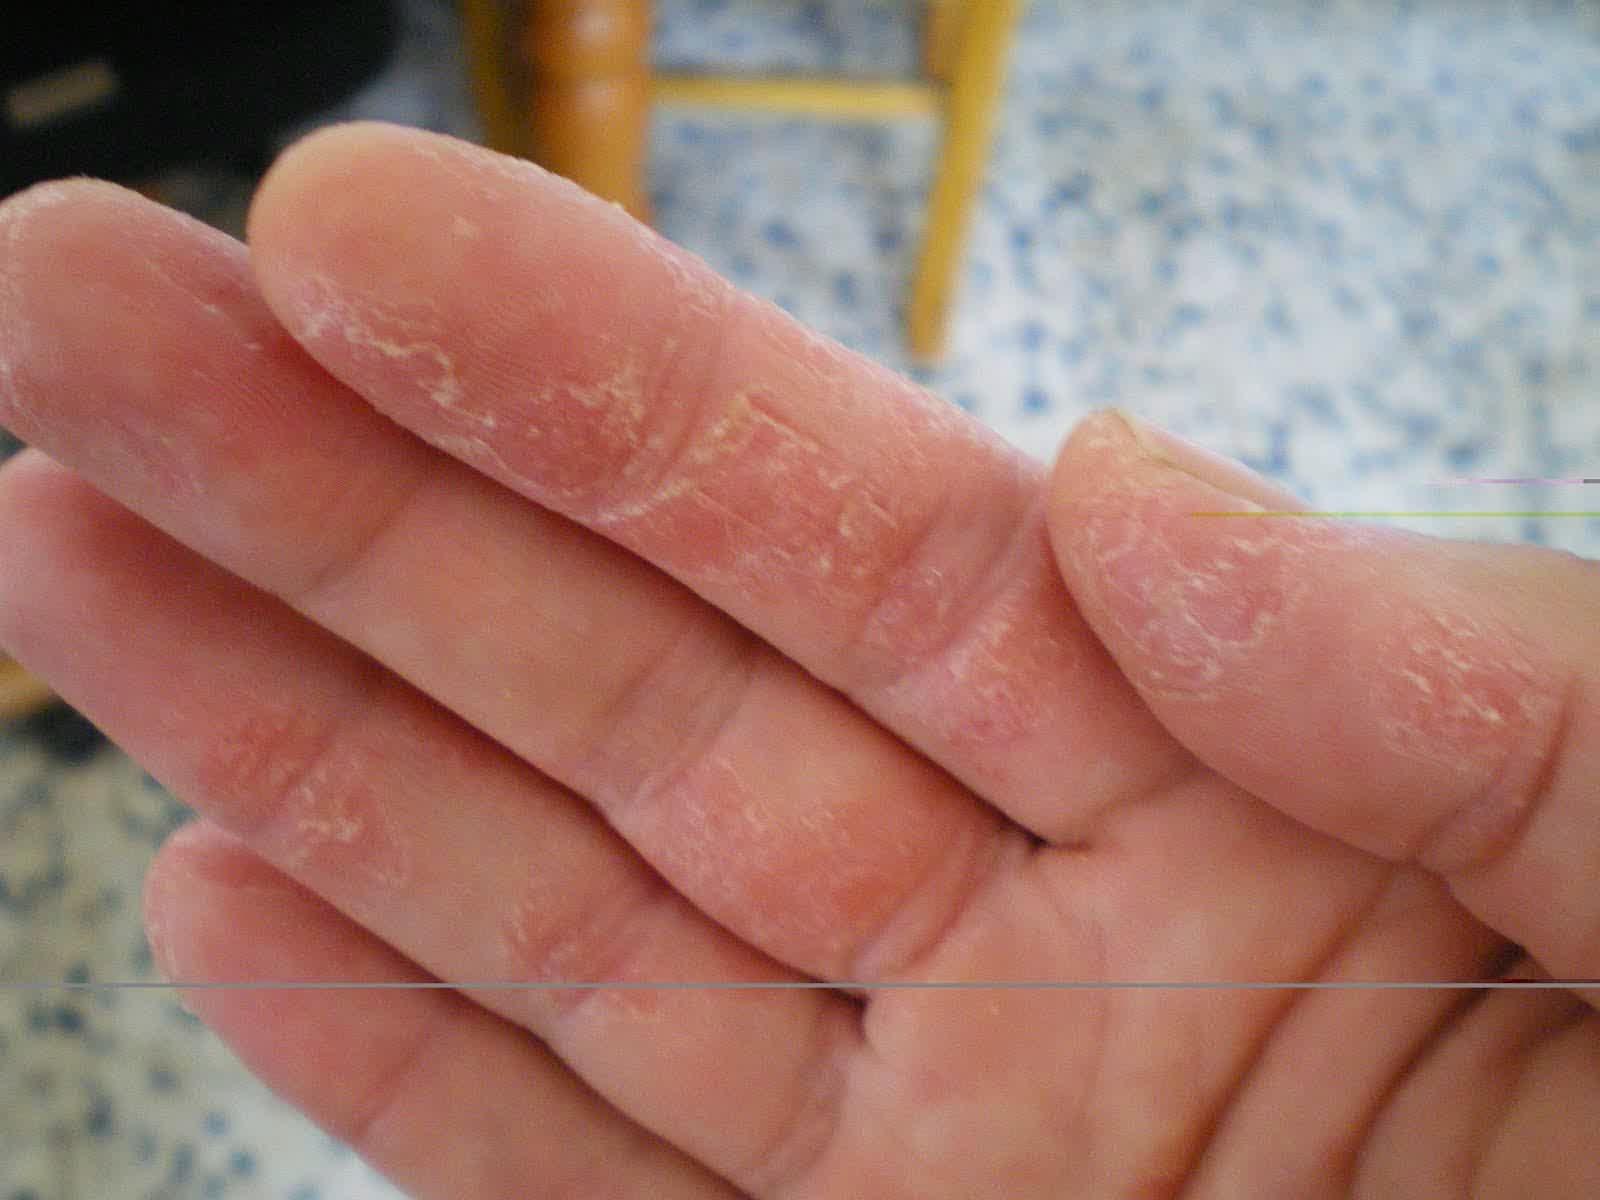 cara melembutkan dan menghaluskan telapak tangan secara alami